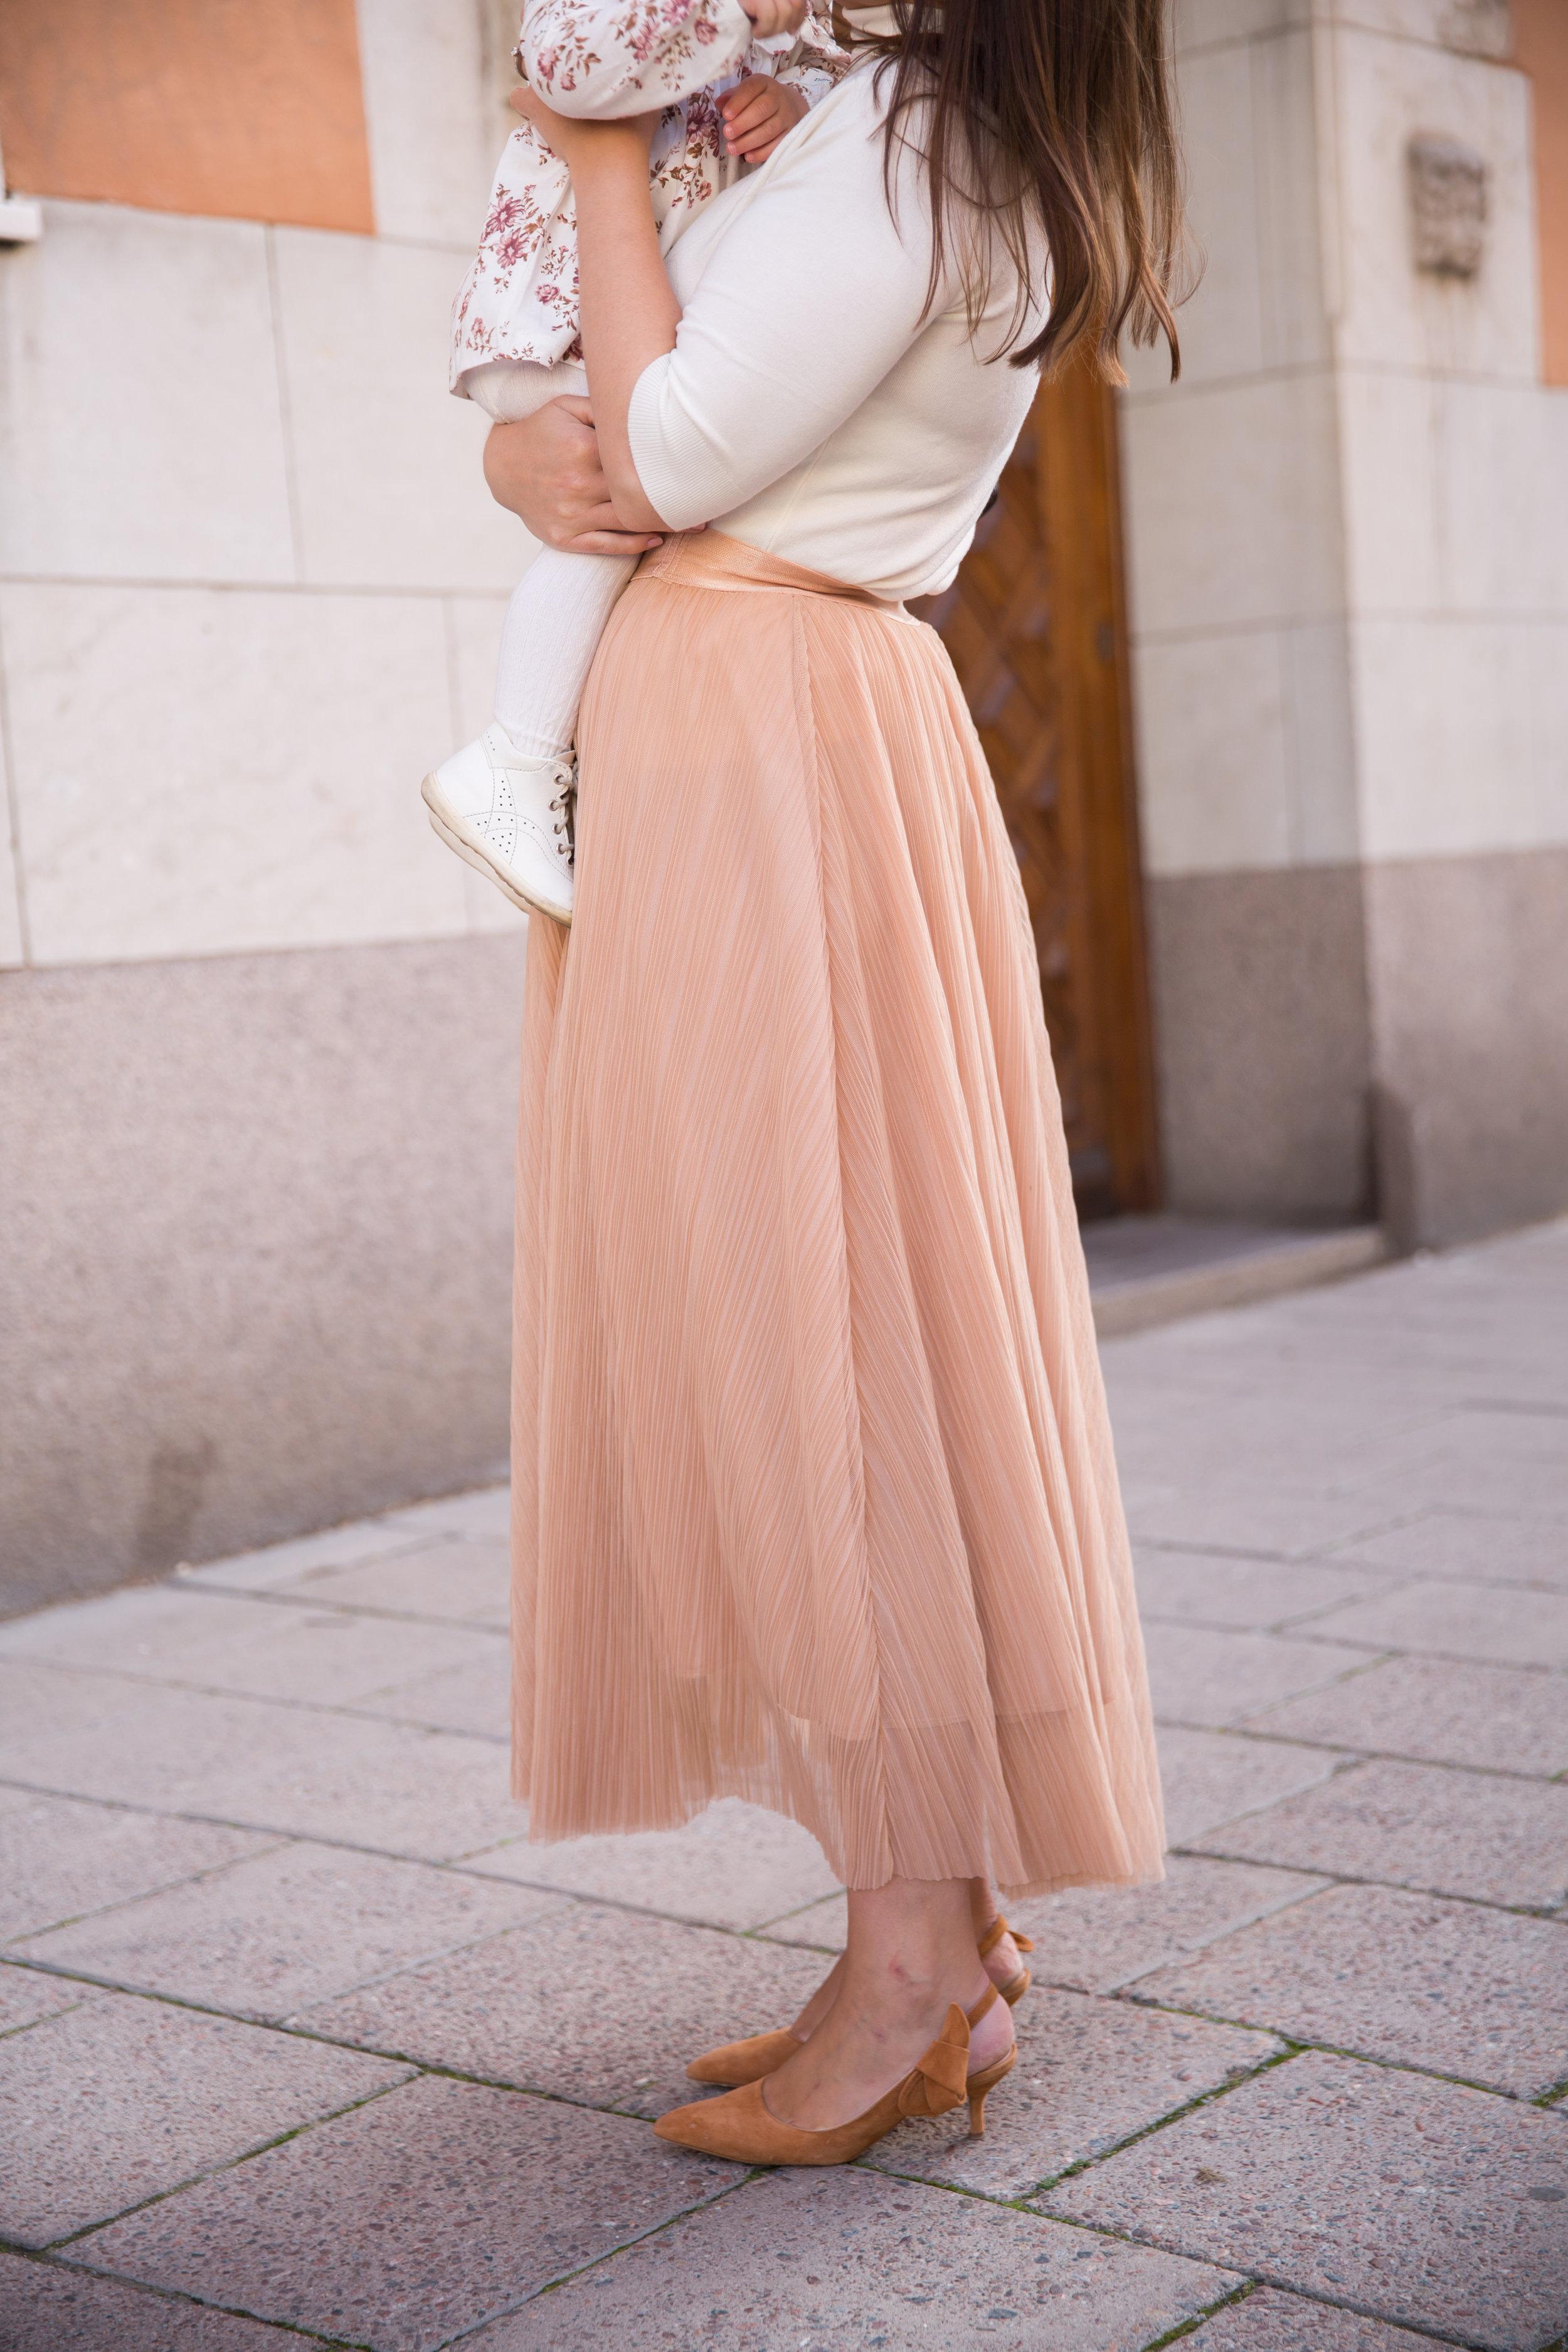 kjol plisserad tyll Angelica Aurell.jpg